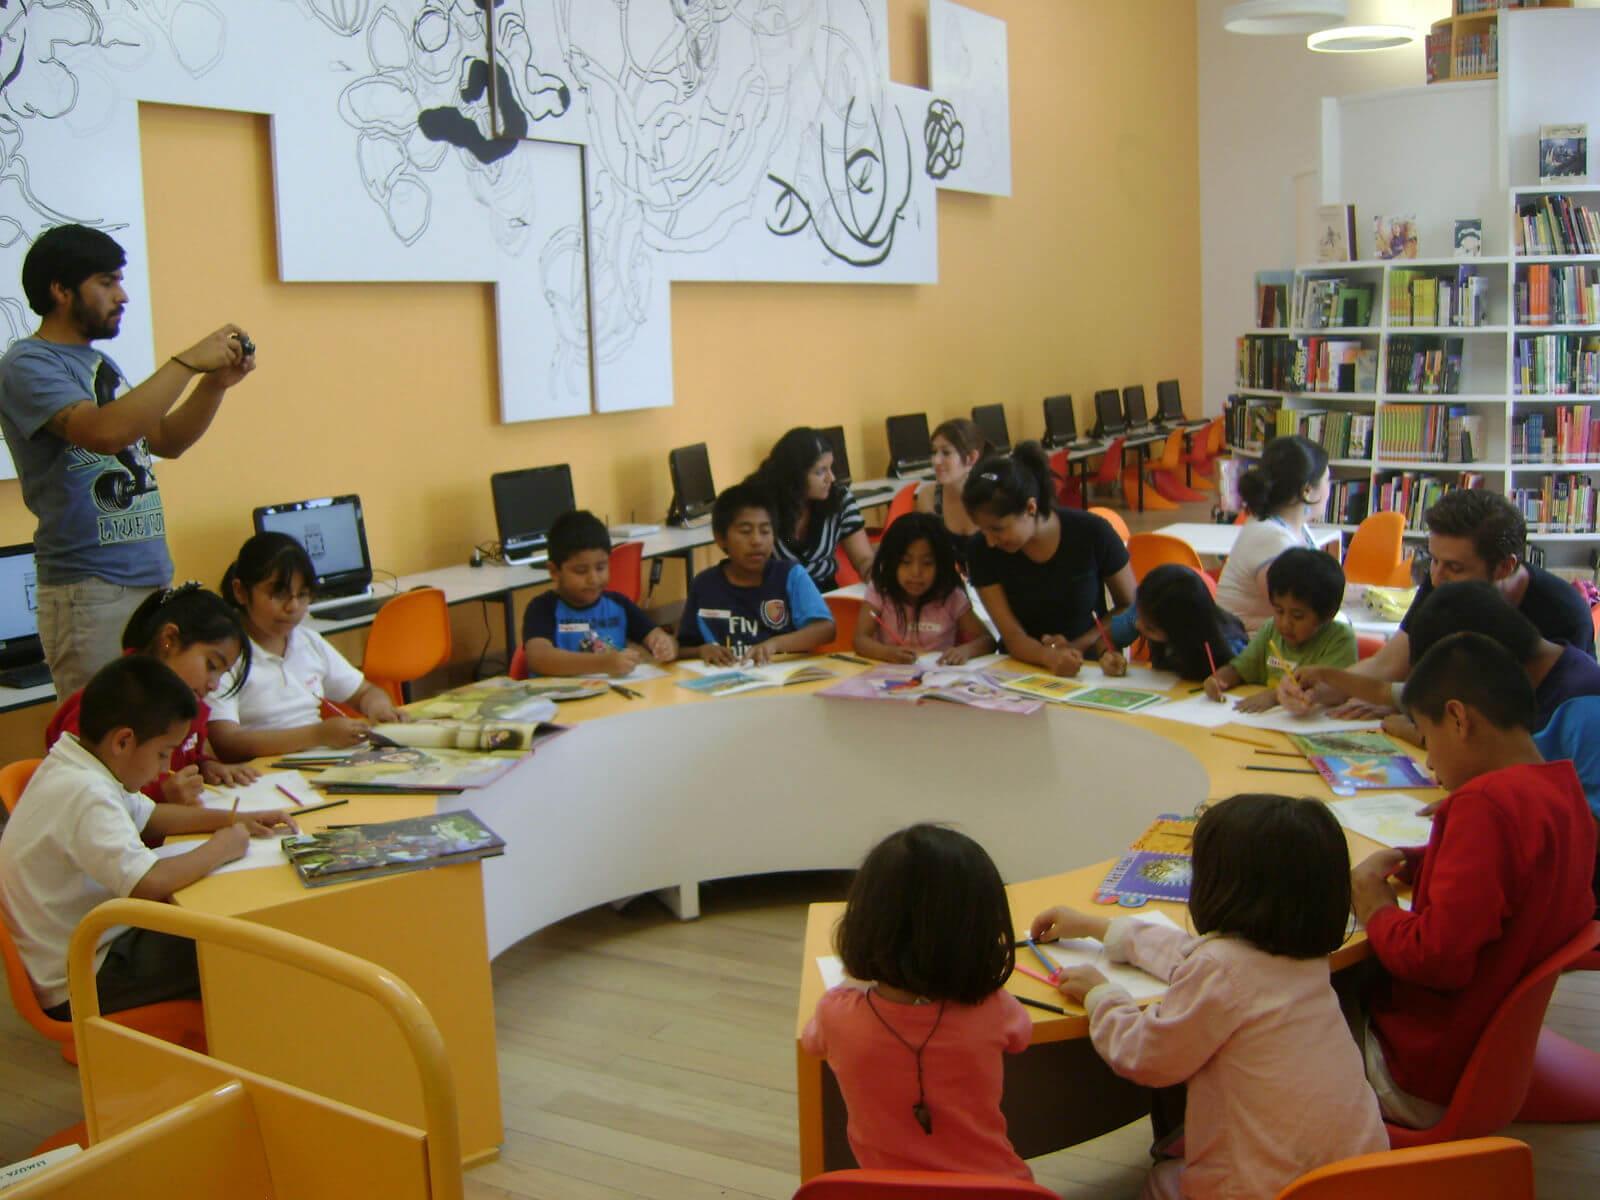 Sala infantil Biblioteca de Mexico